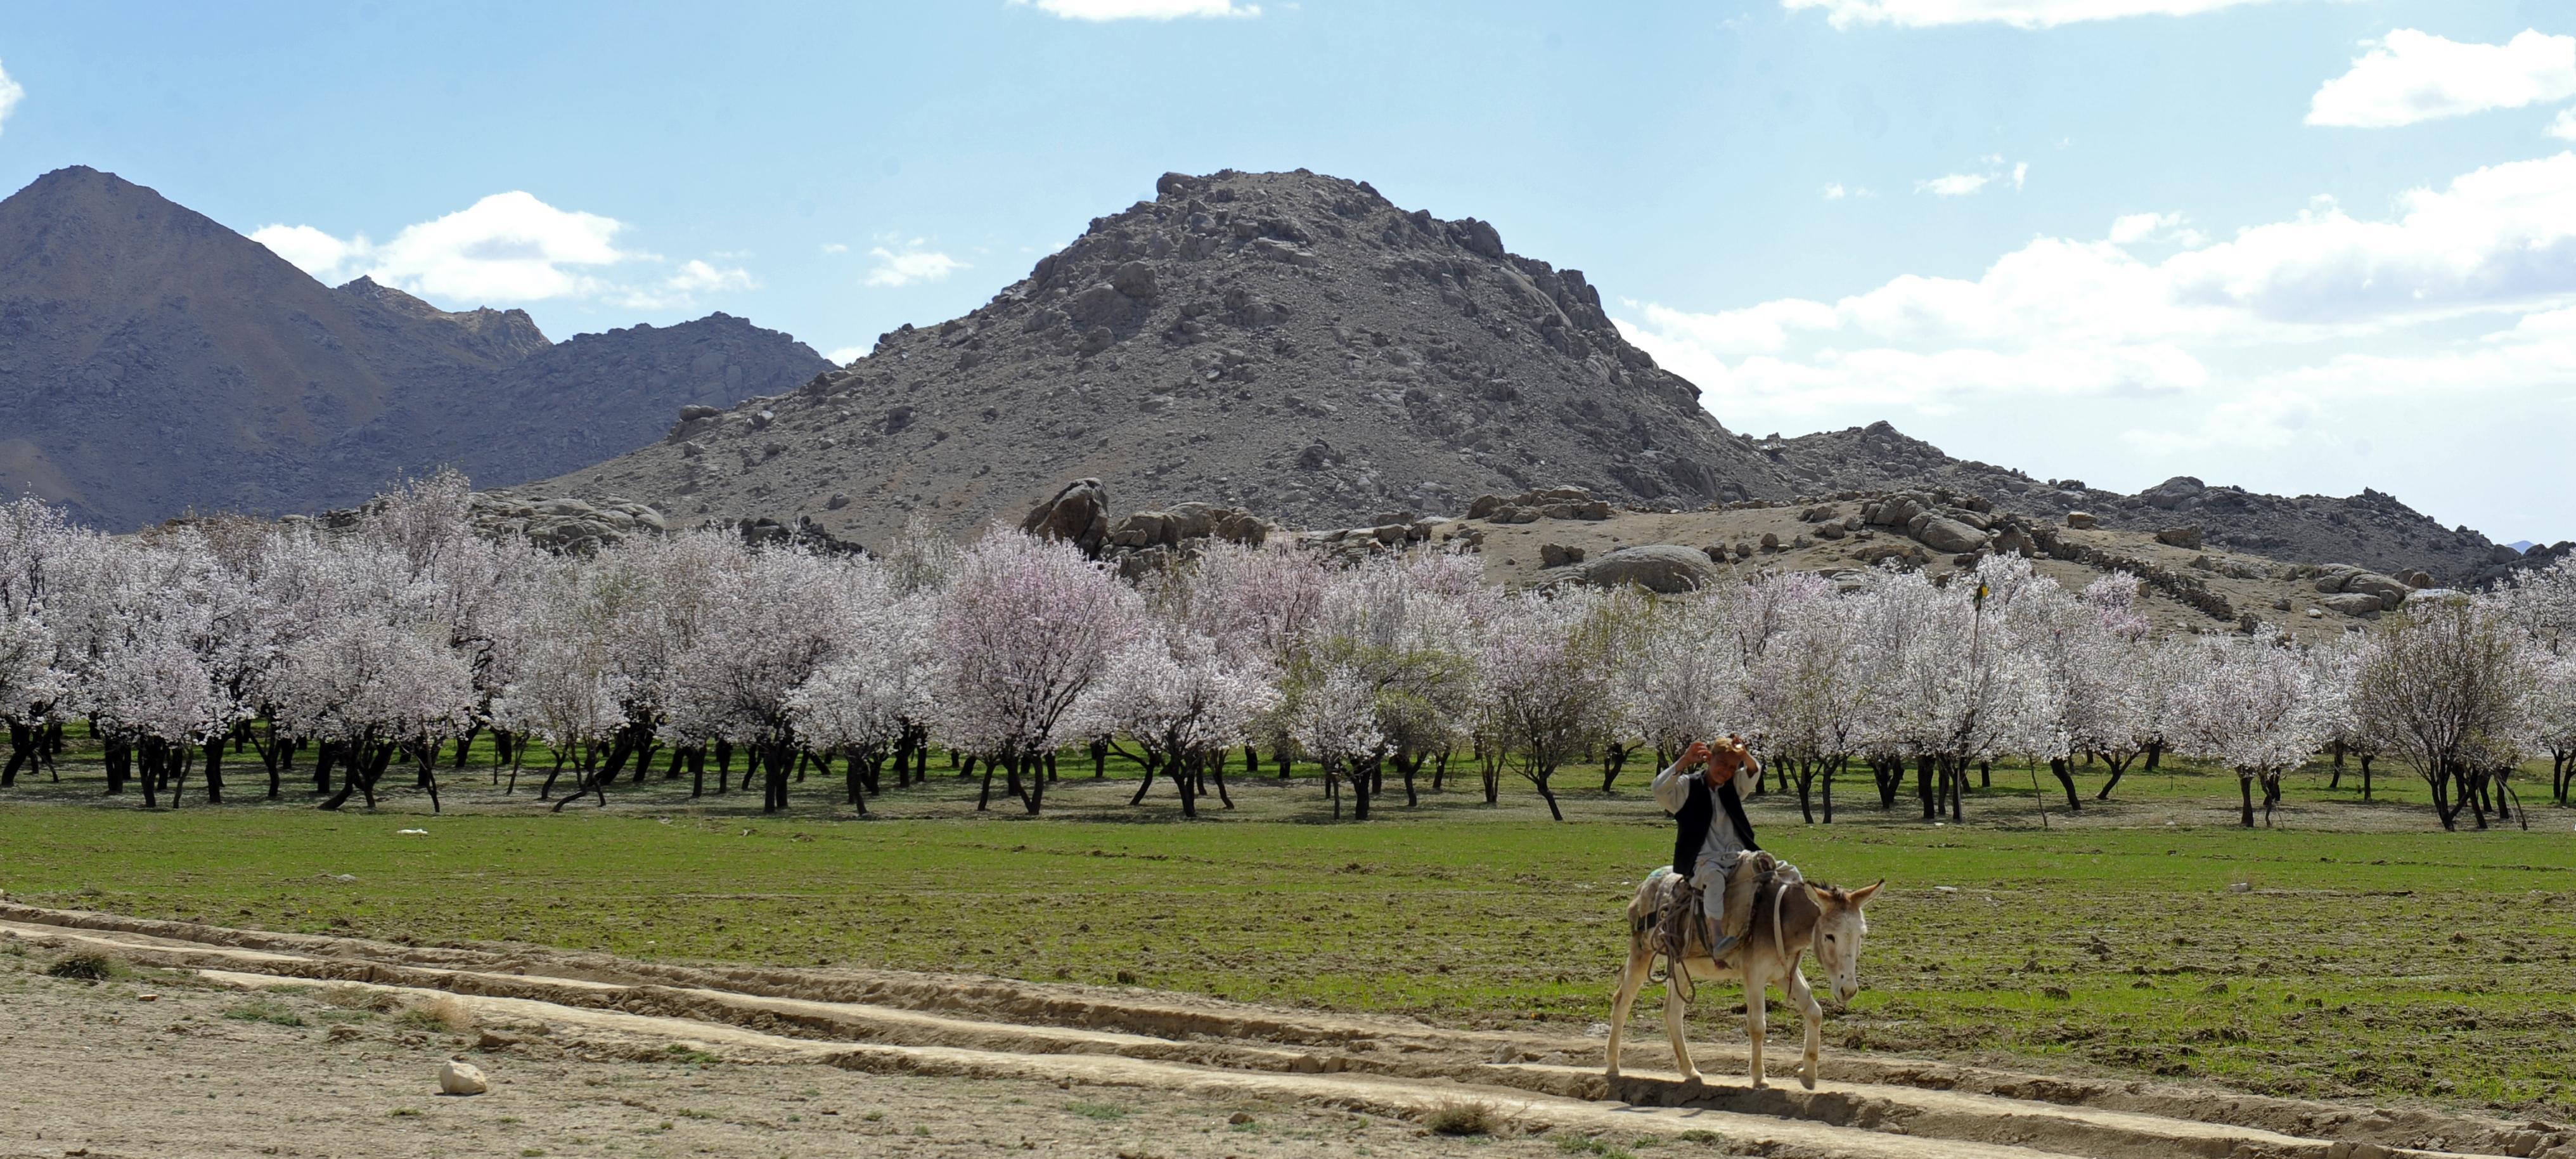 [Image: Almond_trees_in_Zabul_Province_of_Afghanistan.jpg]